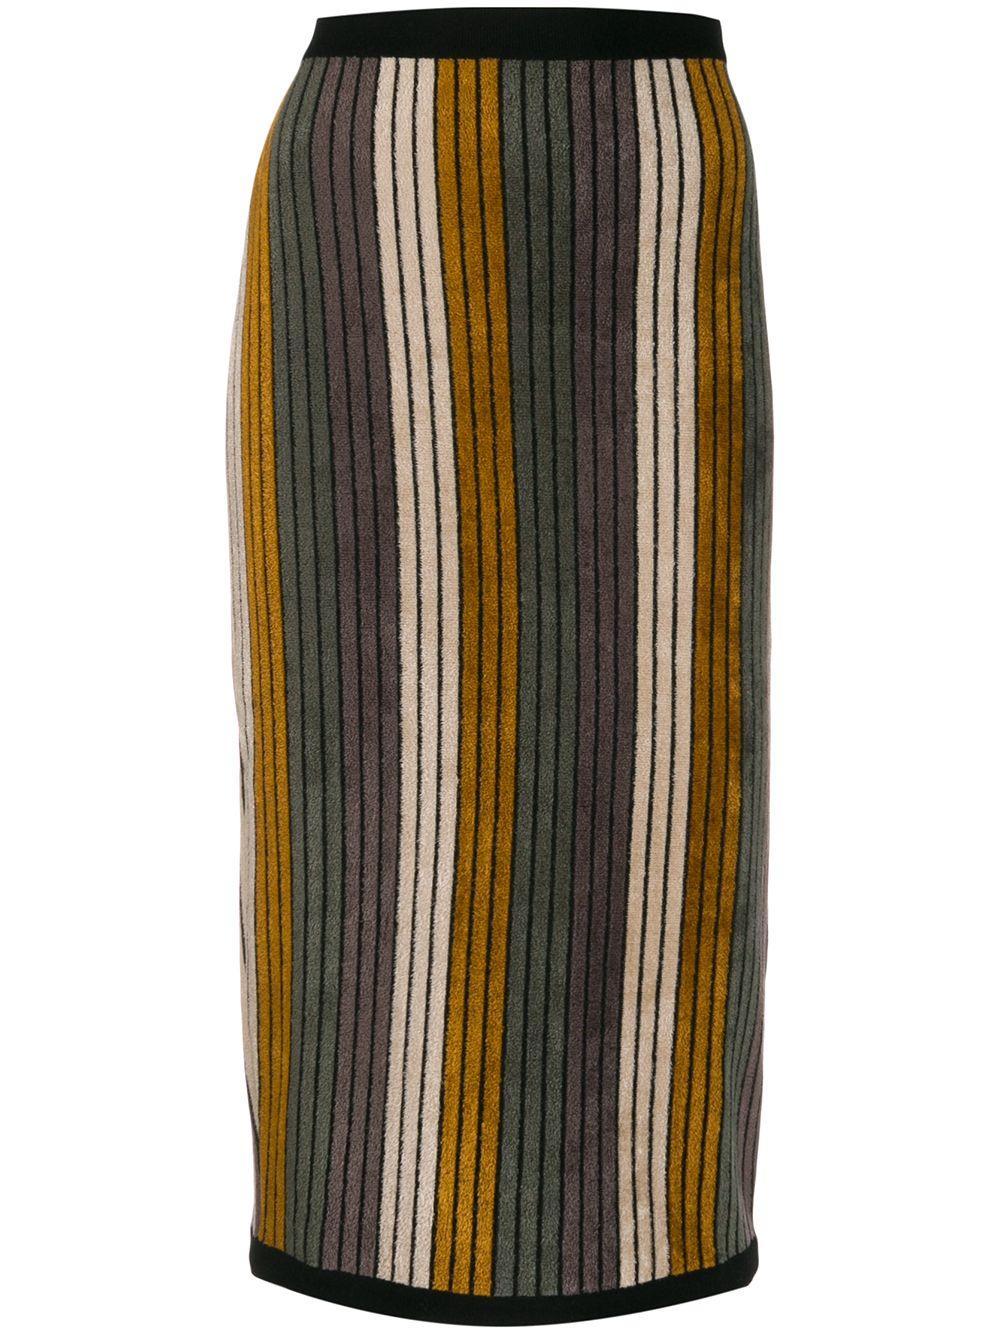 Antonio Marras юбка-карандаш в полоску